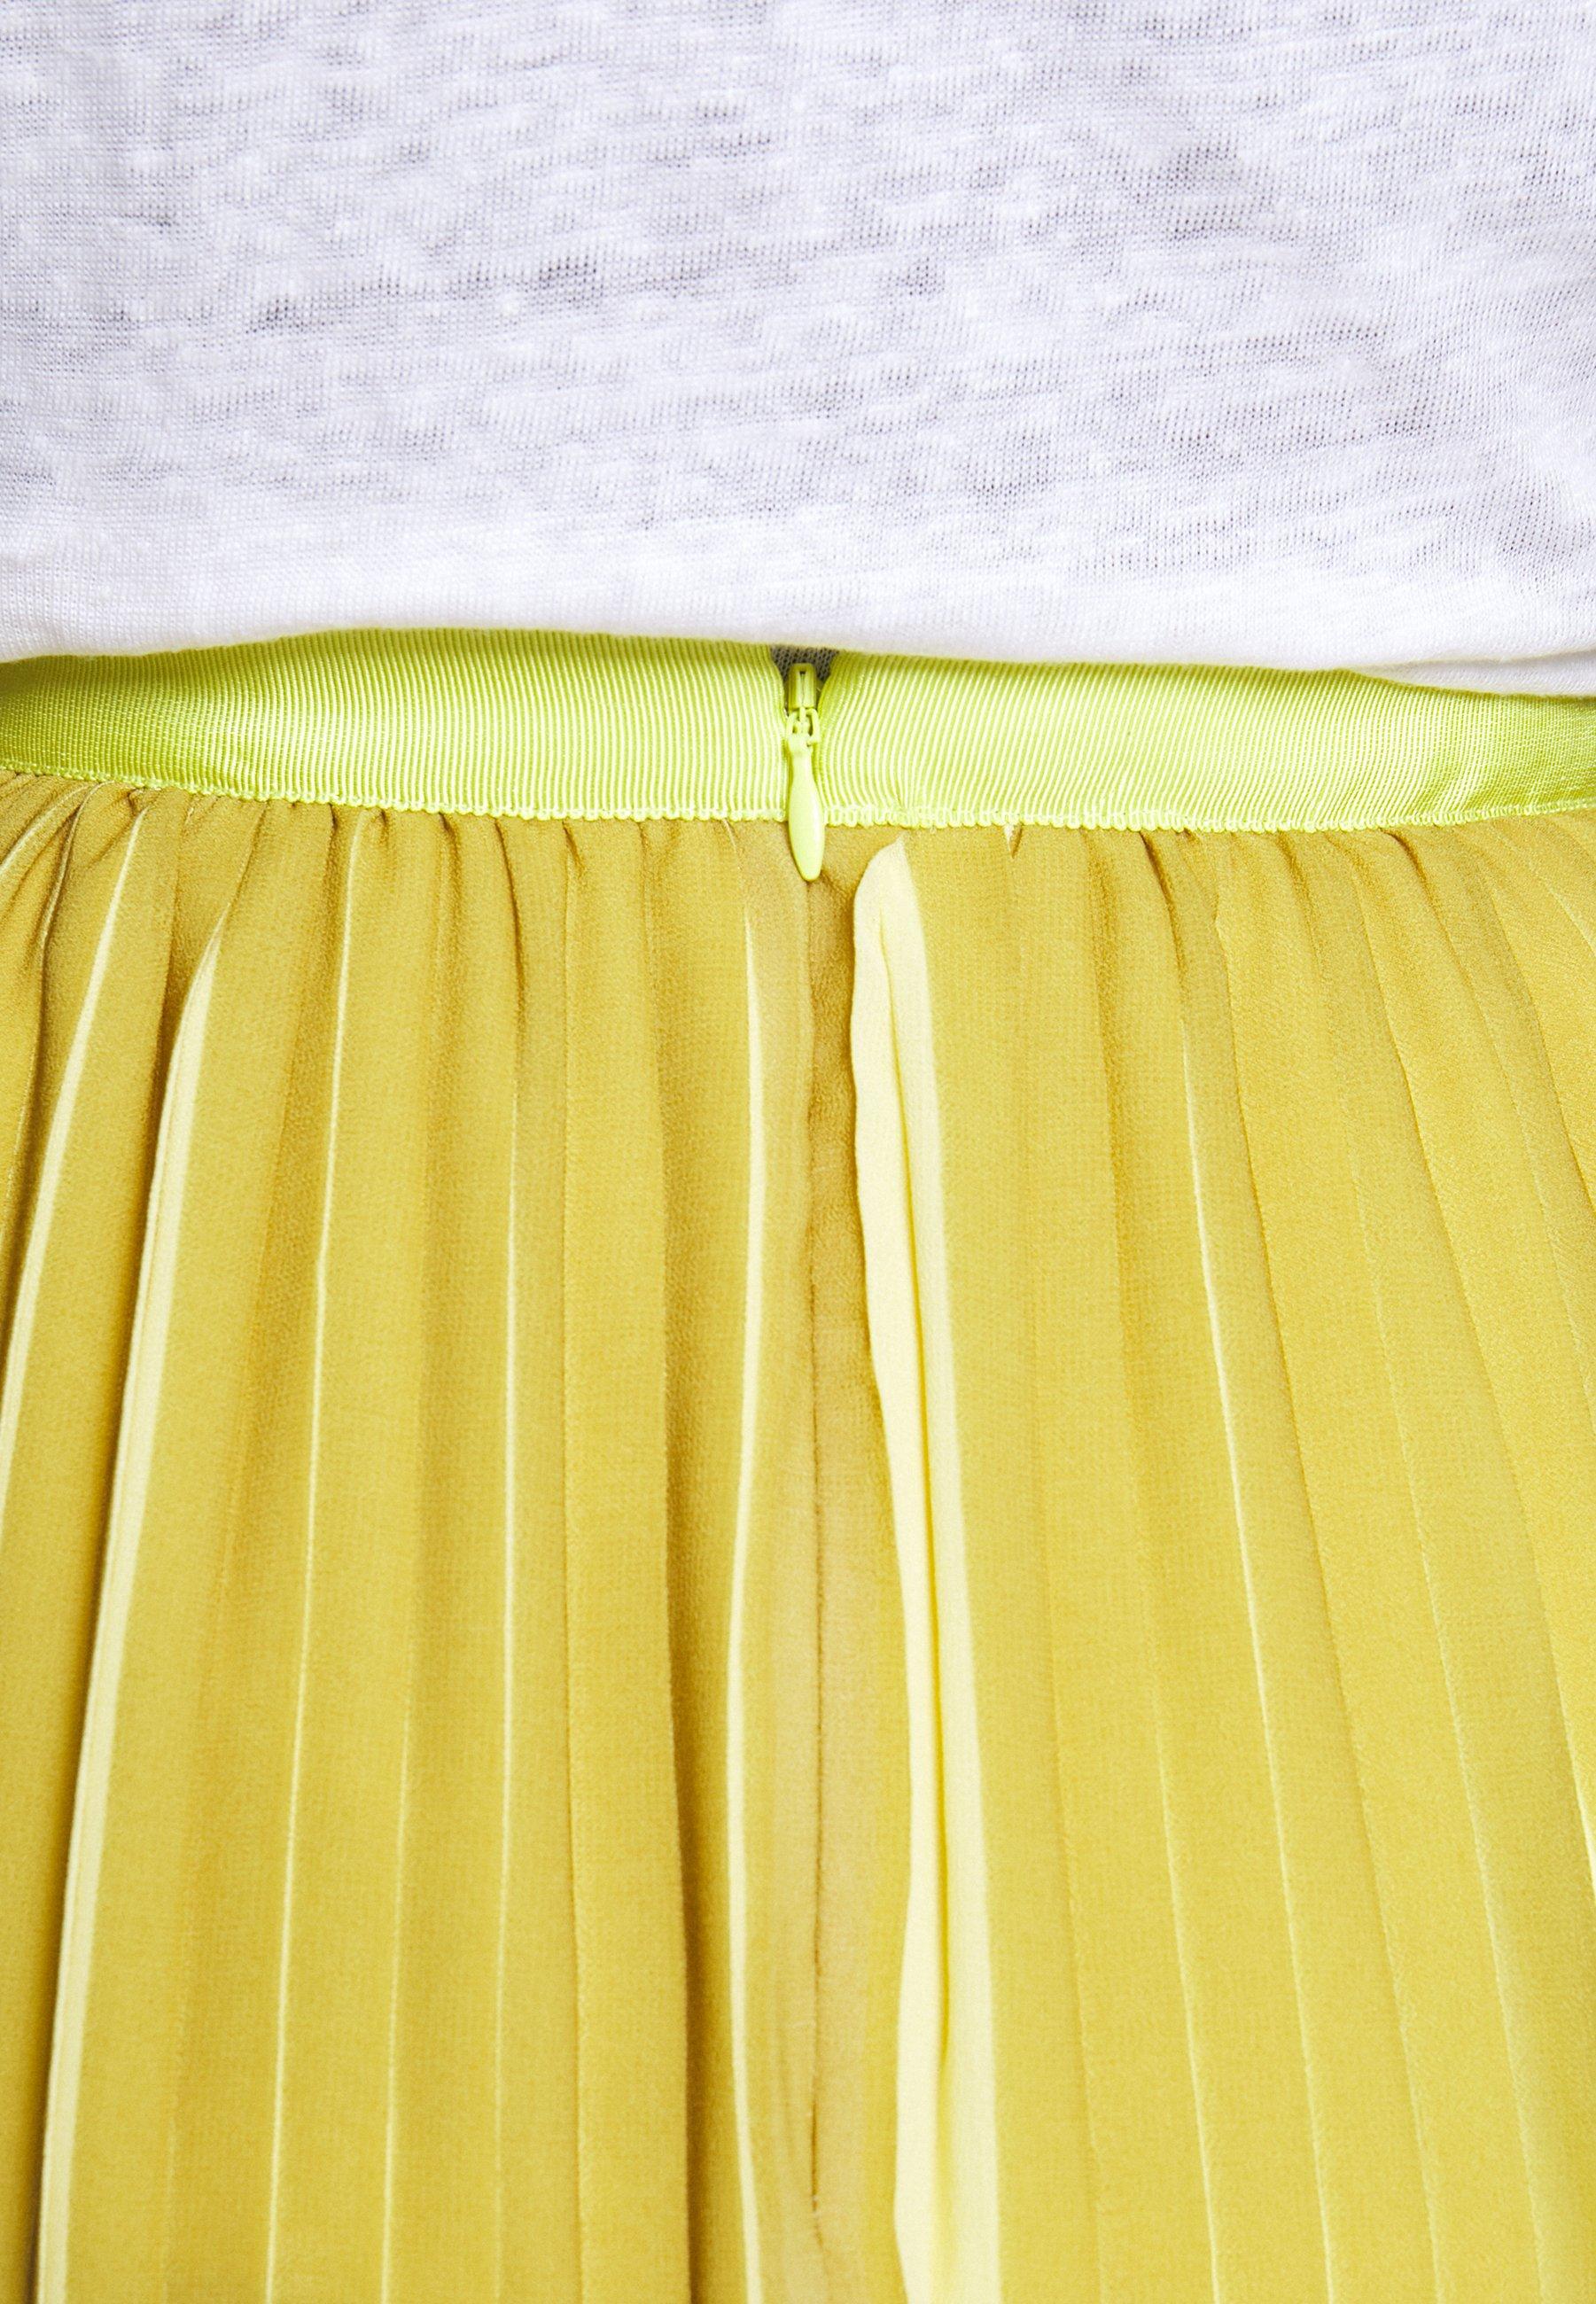 J.crew Dee Skirt Striped - A-linien-rock Golden Citrus Black Friday